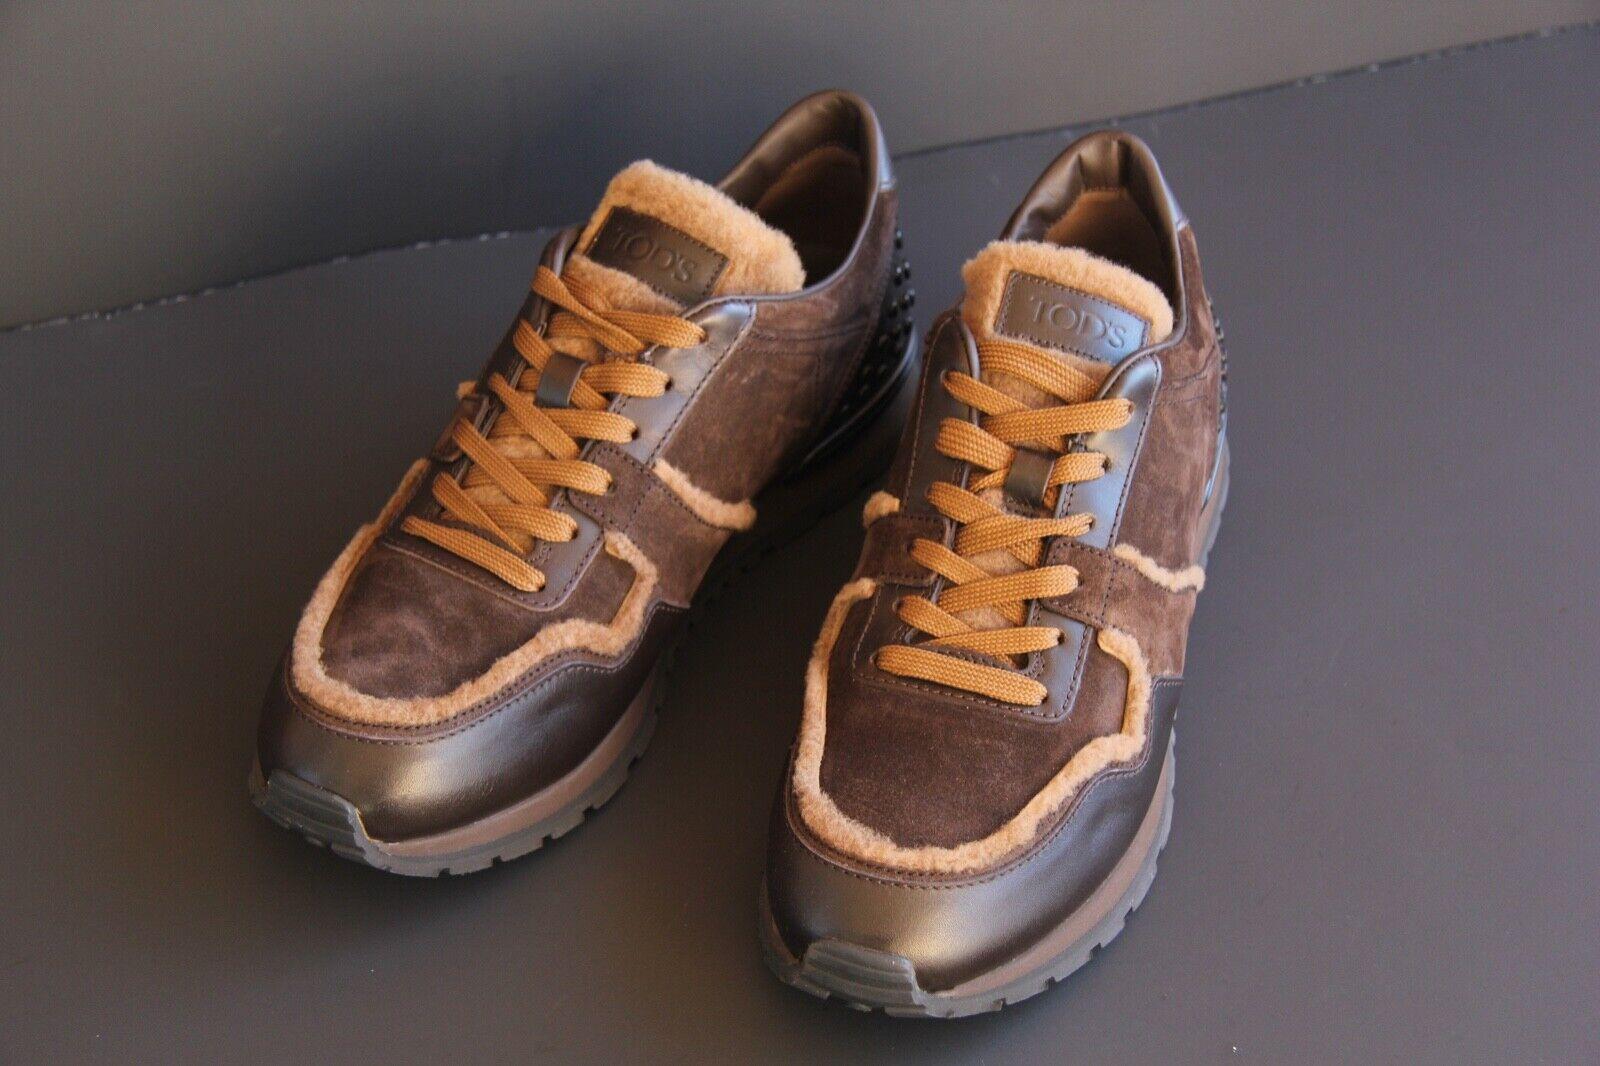 TOD'S LUSSO SCARPE UOMO scarpe da ginnastica ALL. Dots SPOILER tg. 9 (43) neu&ovp TODS